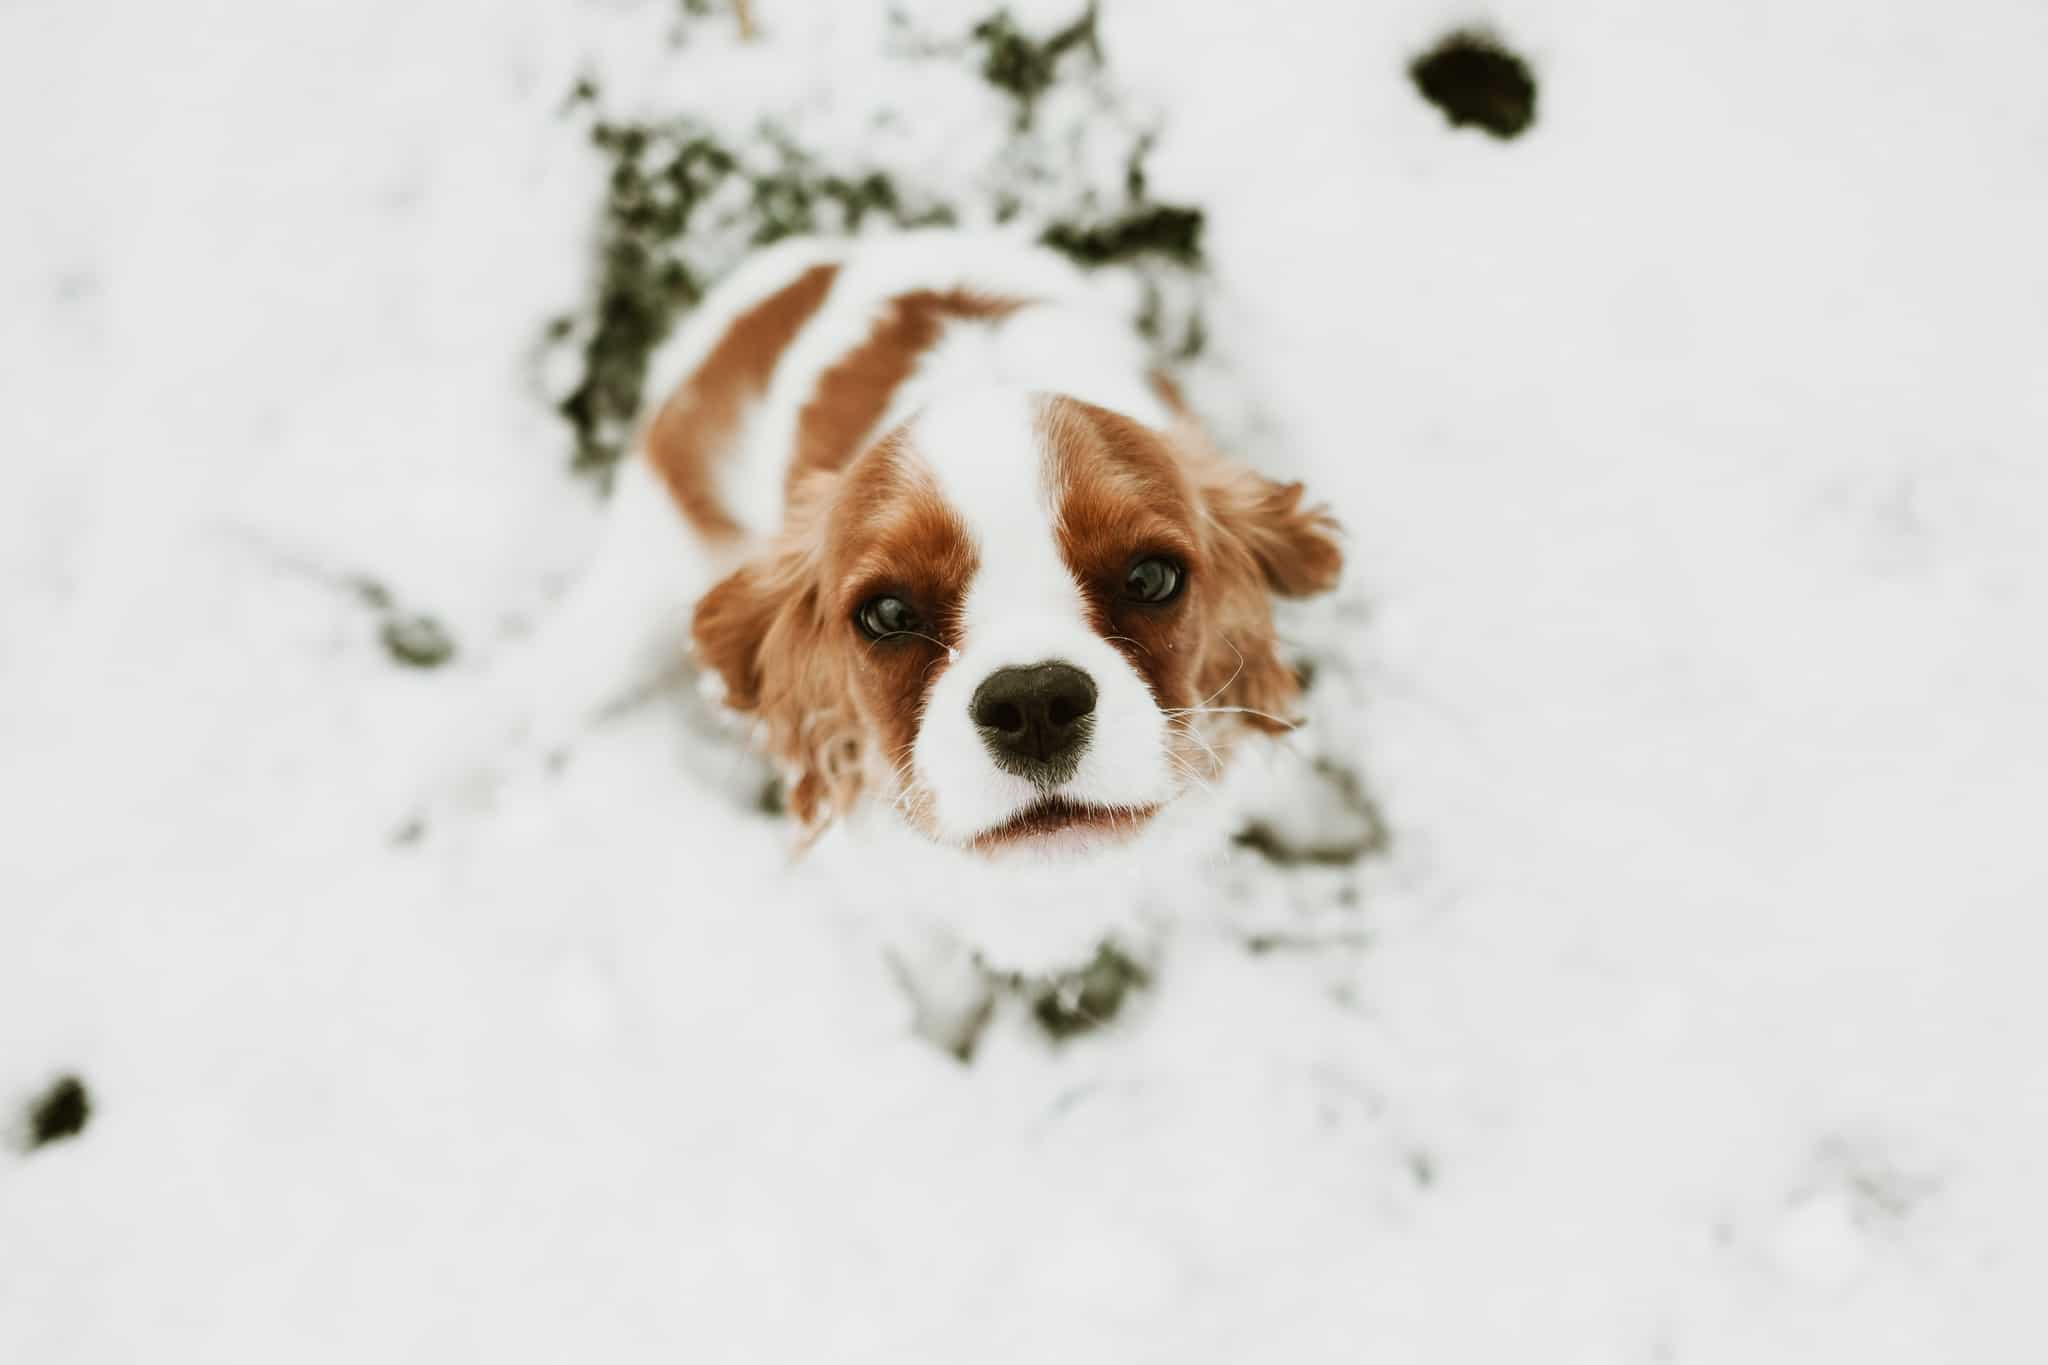 Amazing Snow Photos That Show The Magic Of Winter Season